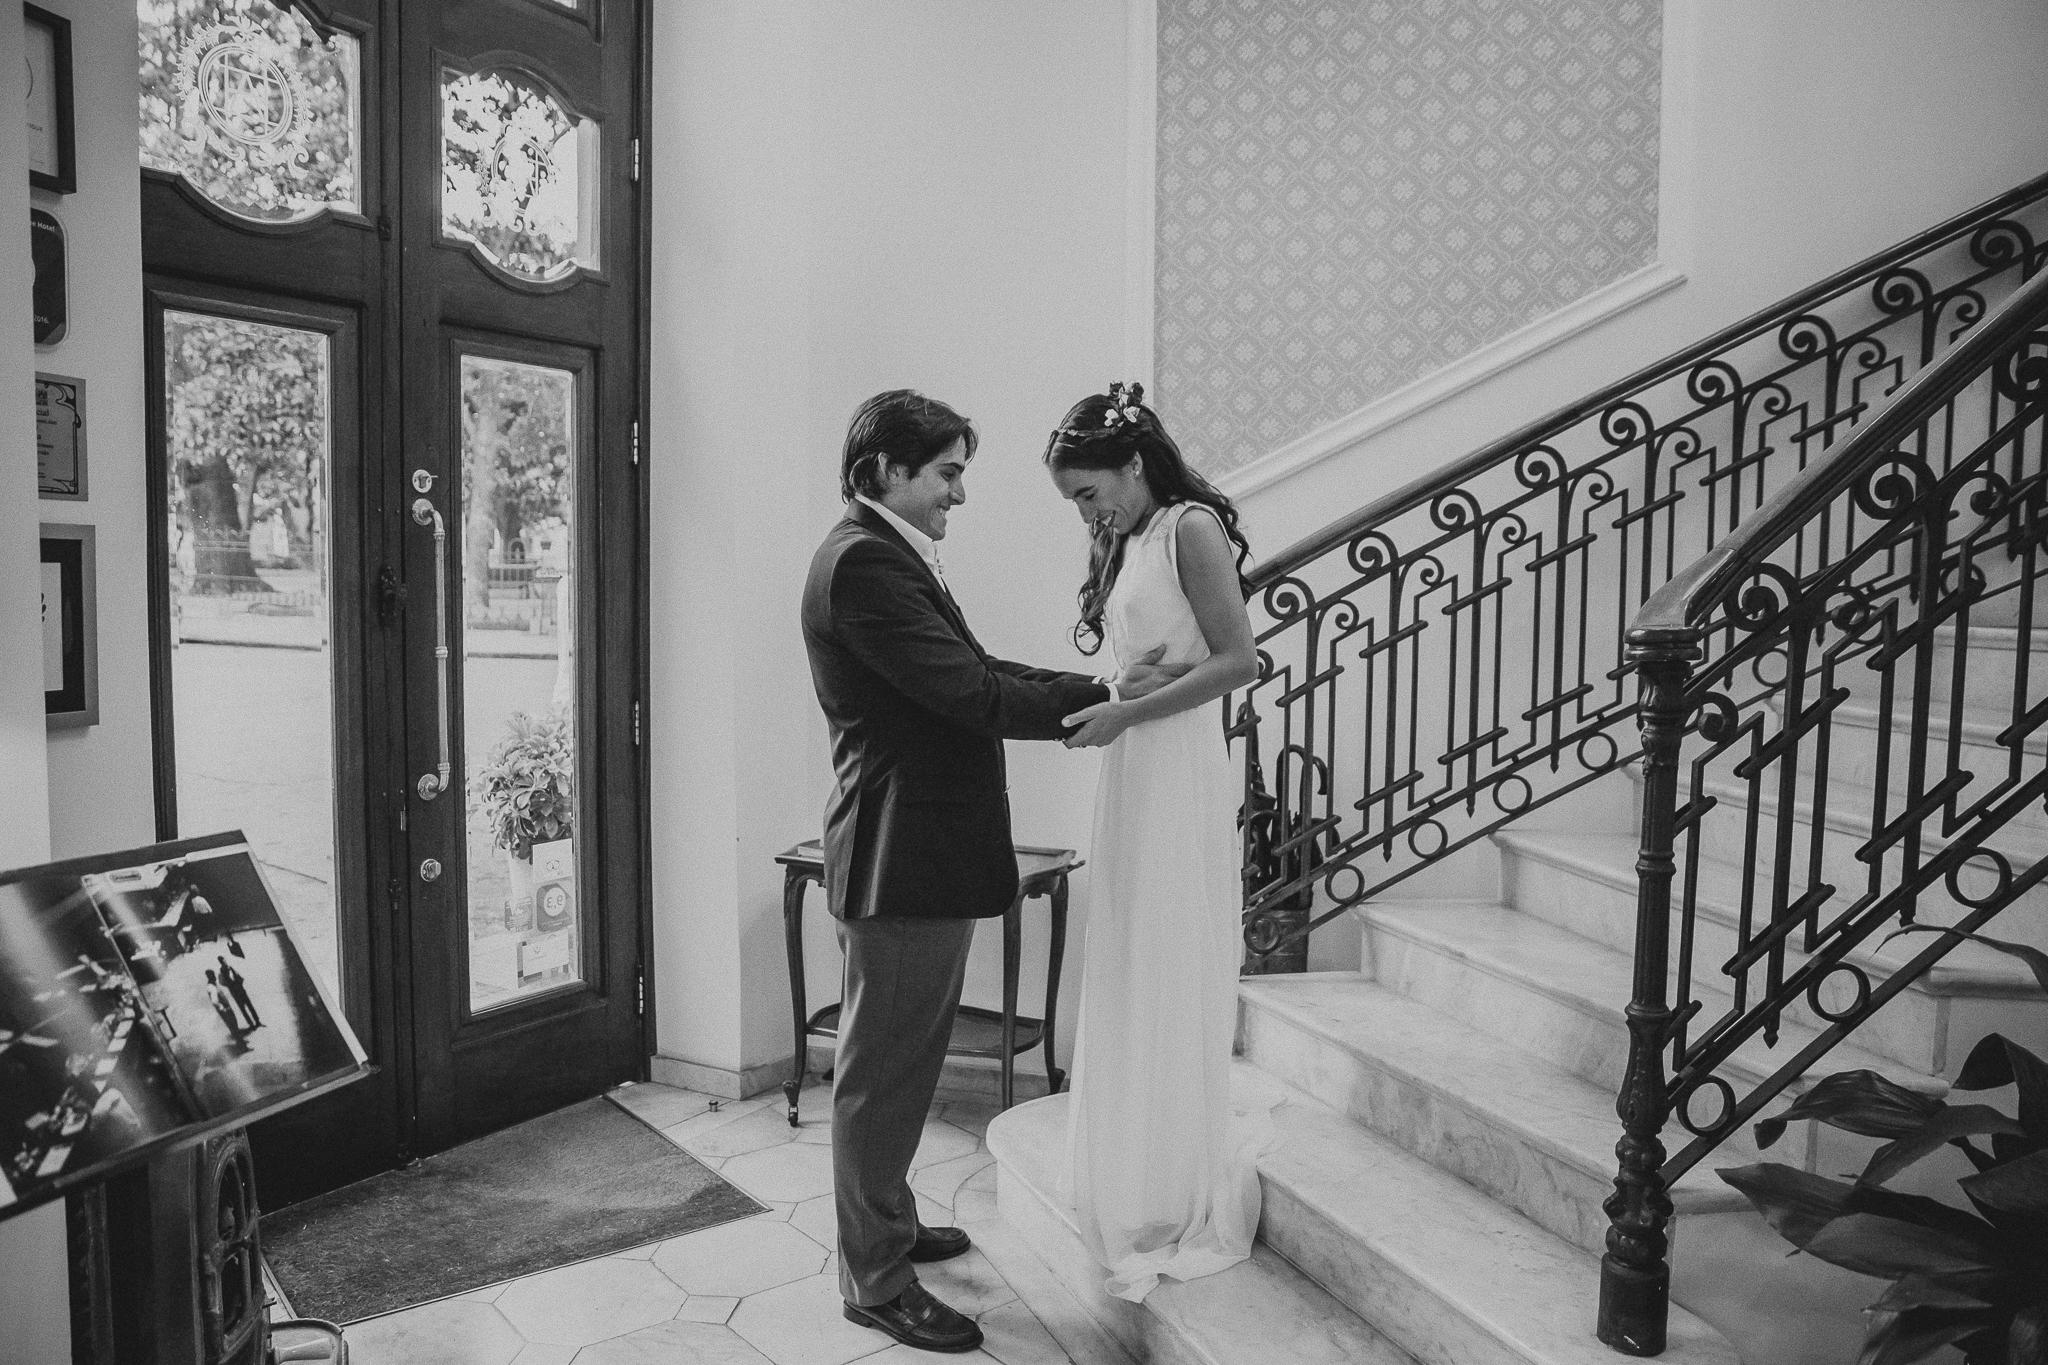 hotel alma histórica - bodas uruguay - mika alvarez - myn01